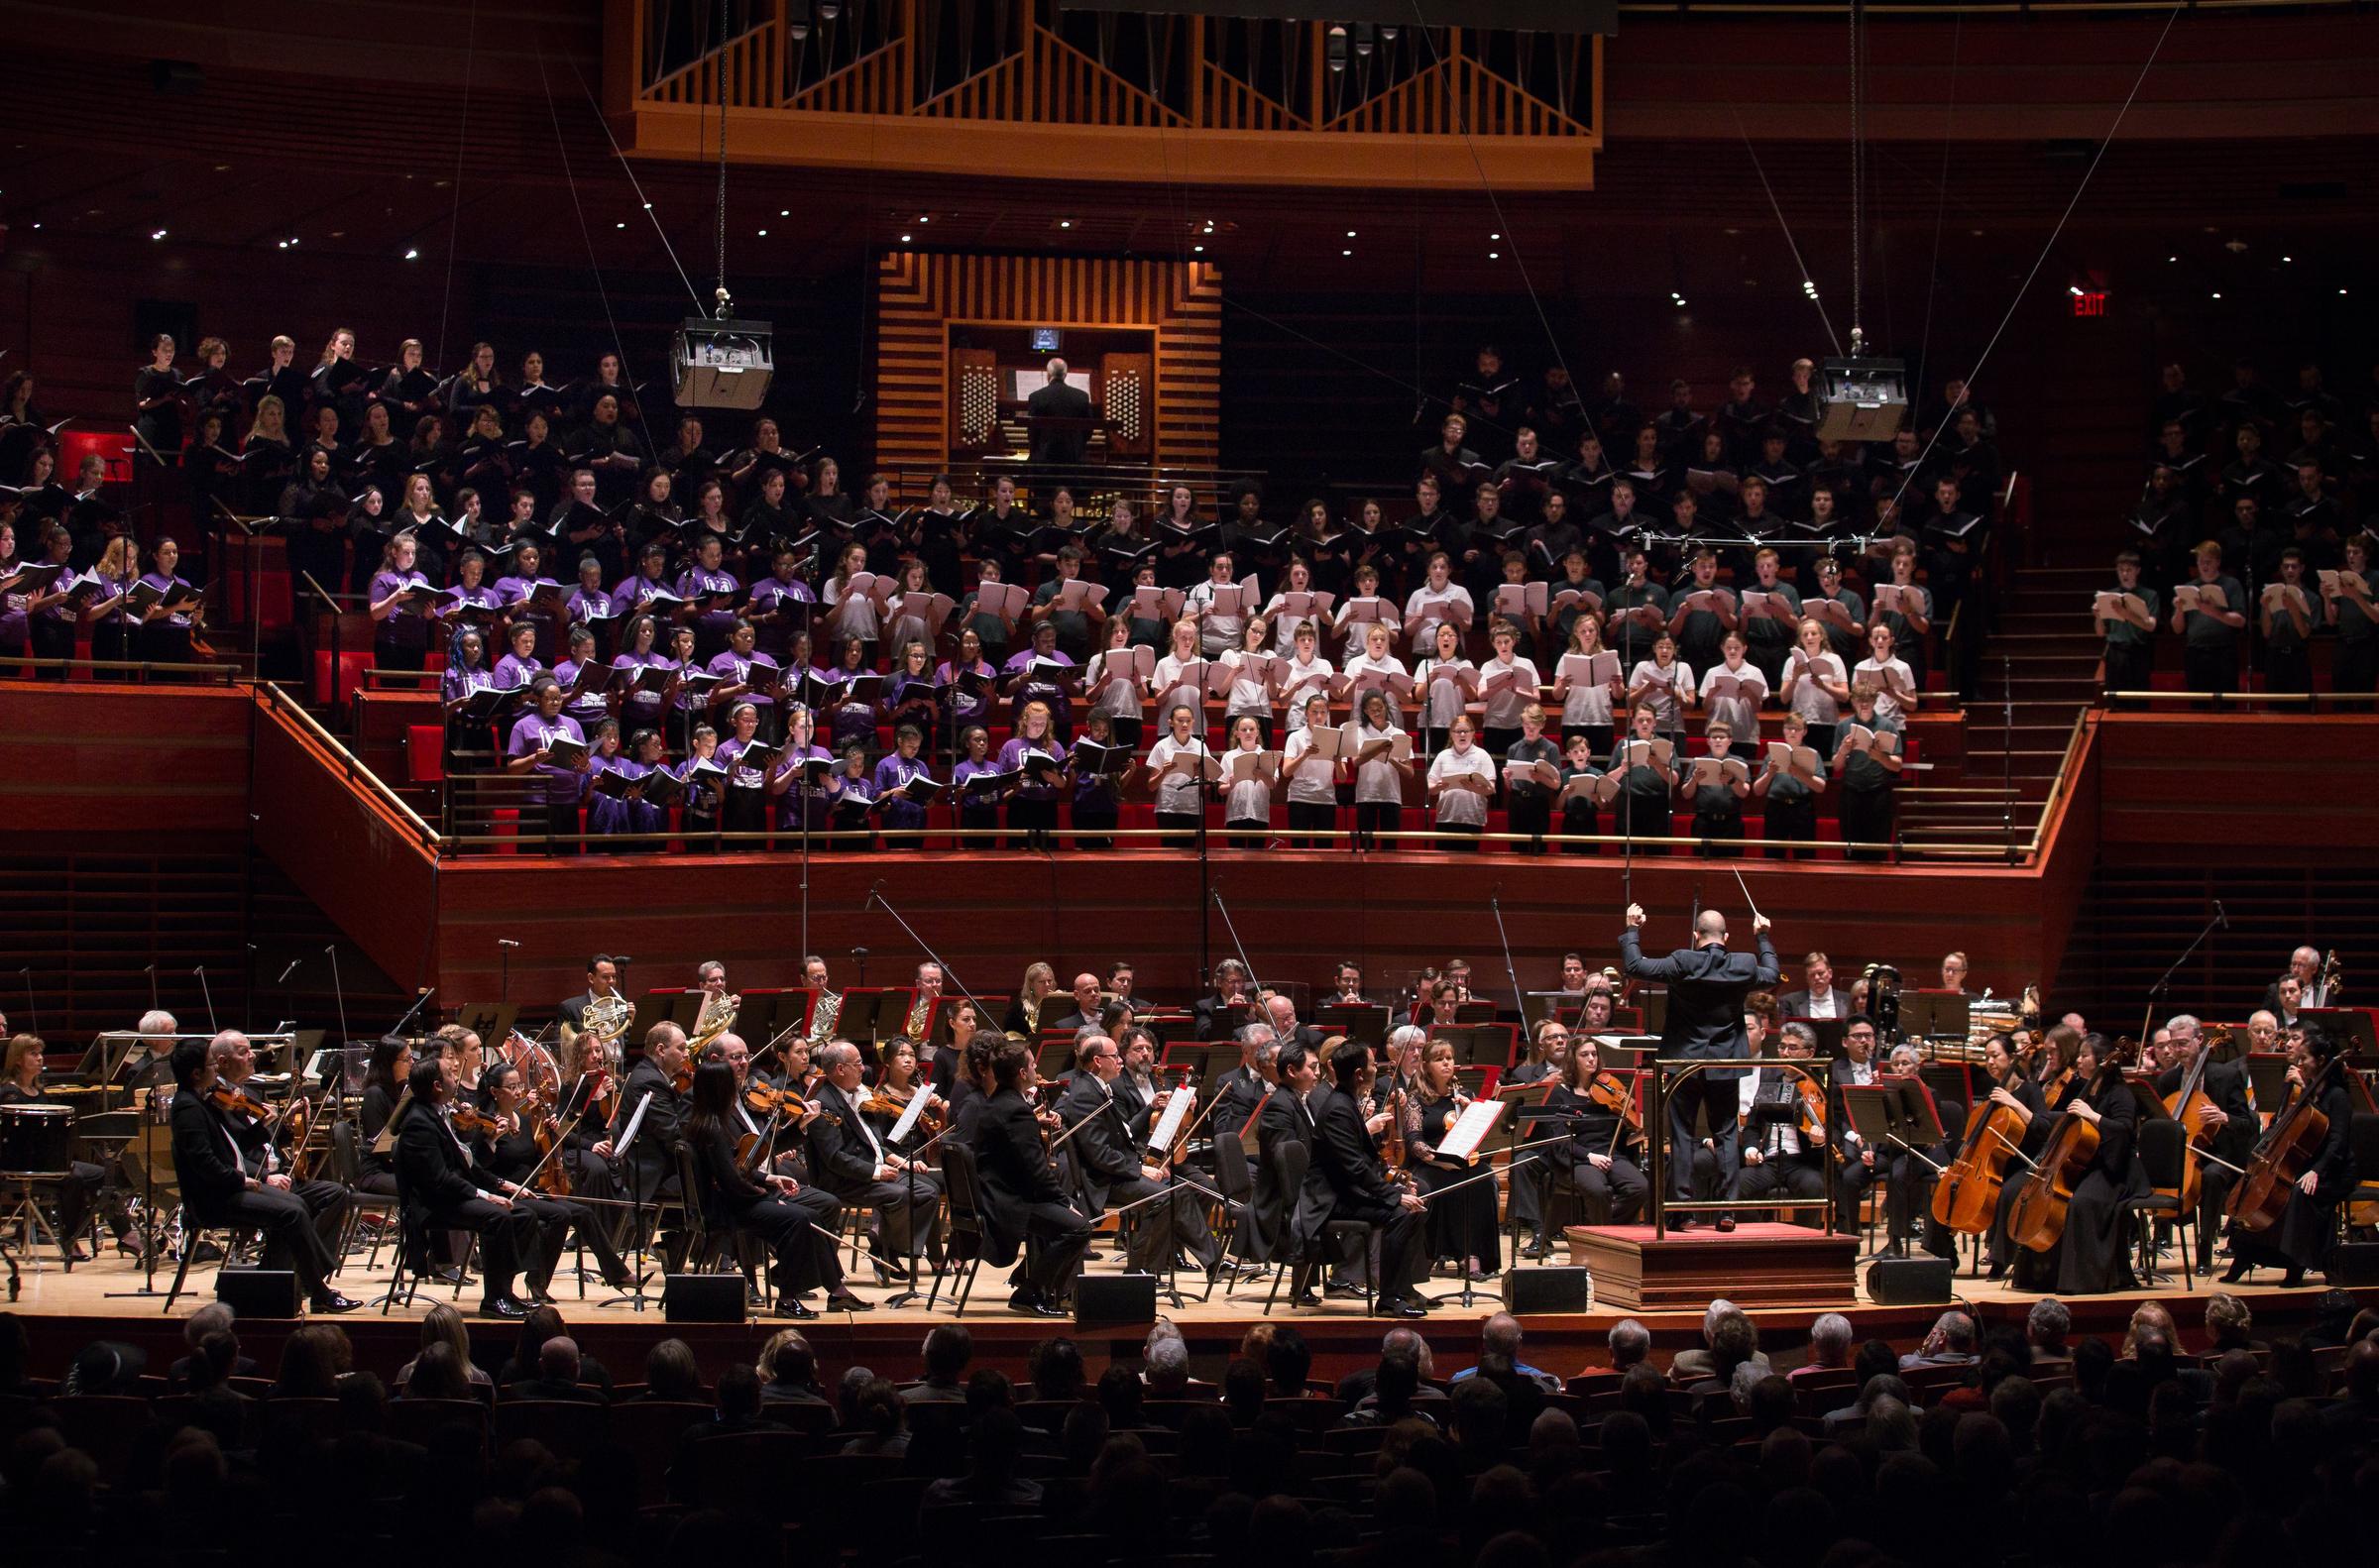 The Philadelphia Orchestra at Thursday´s performance, with the Westminster Symphonic Choir, Keystone State Boychoir, Pennsylvania Girlchoir, Sister Cities Girlchoir.